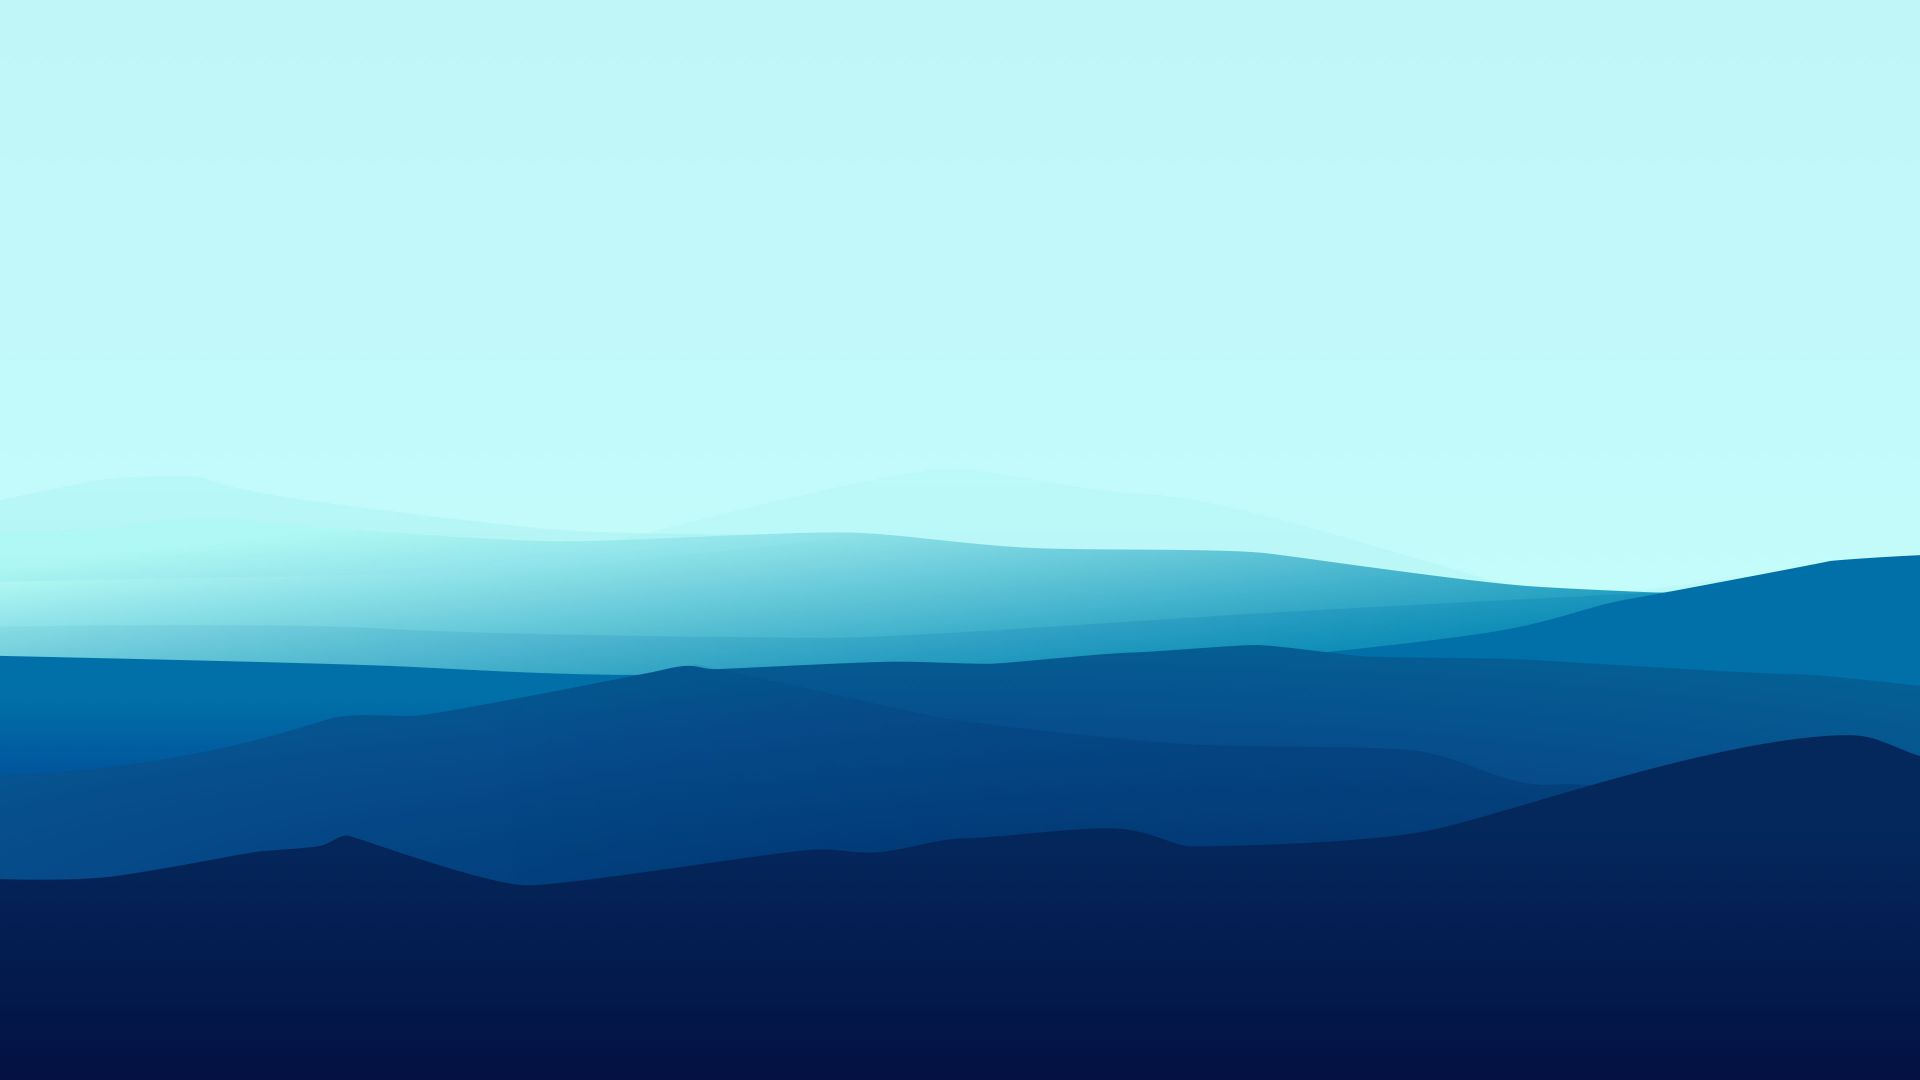 Wallpaper Landscape Flat 4k 5k Fog Iphone Wallpaper Forest Blue Art 11927 Page 997